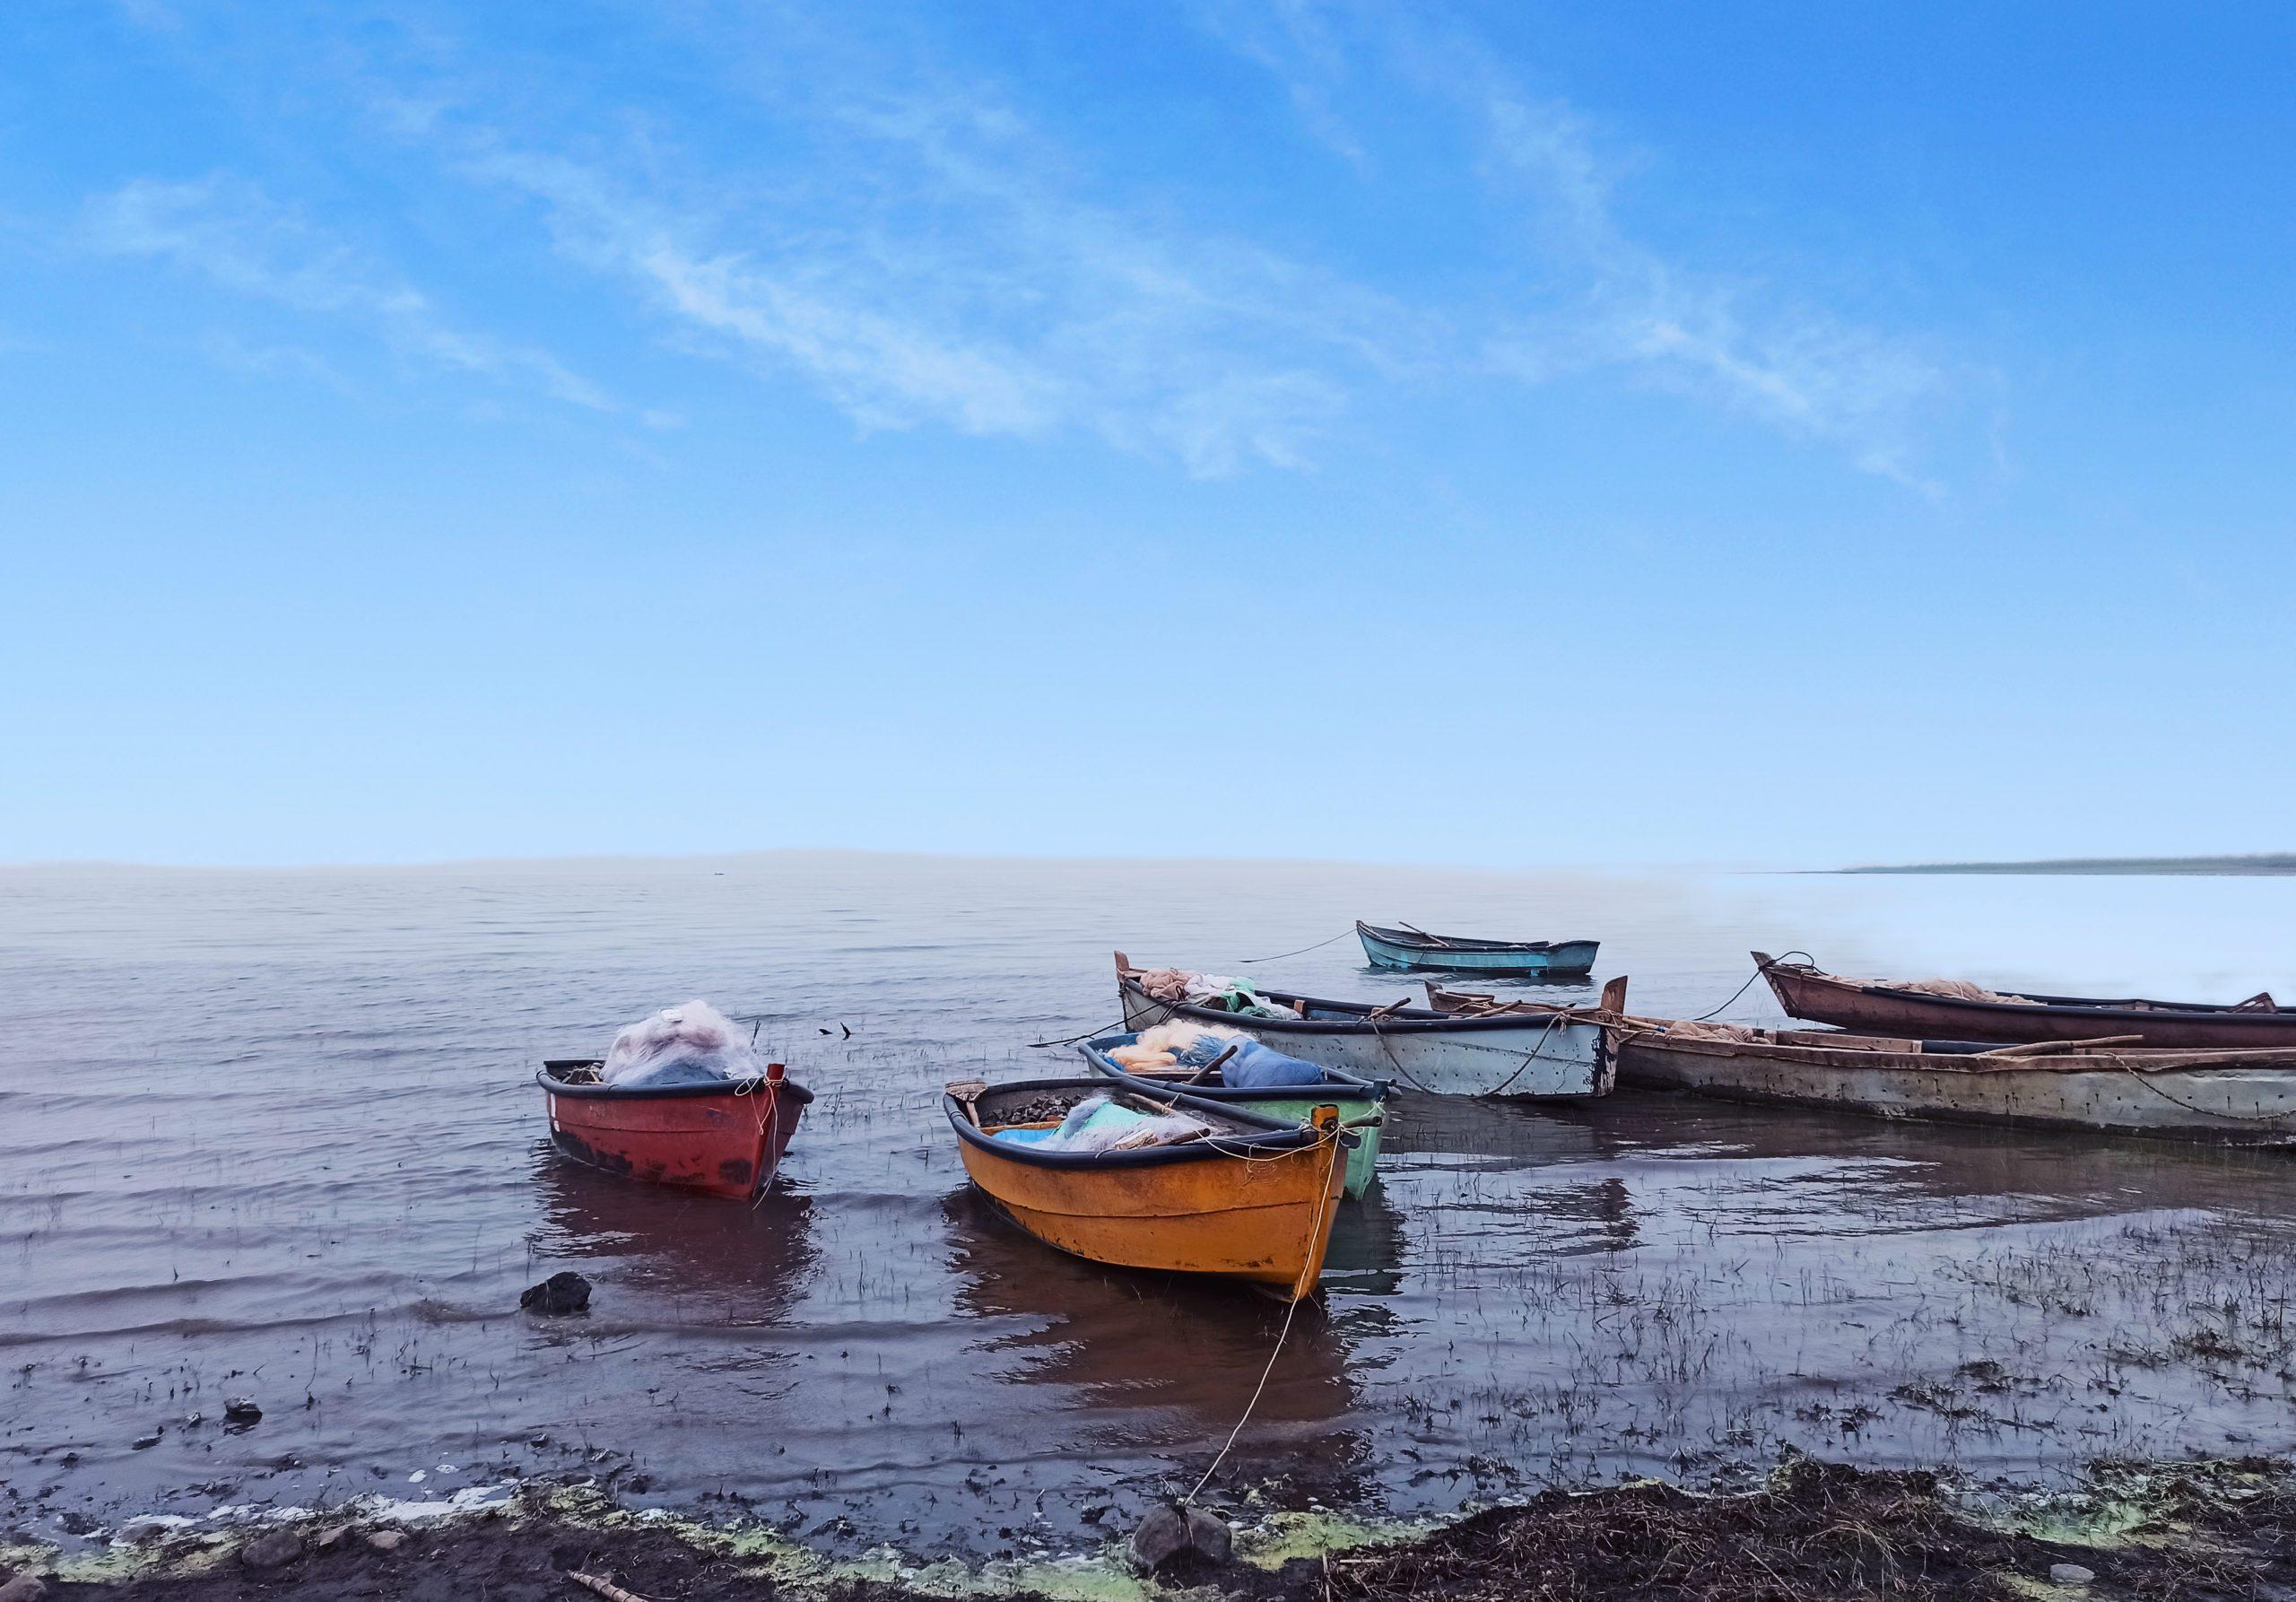 Fishing boat at seashore